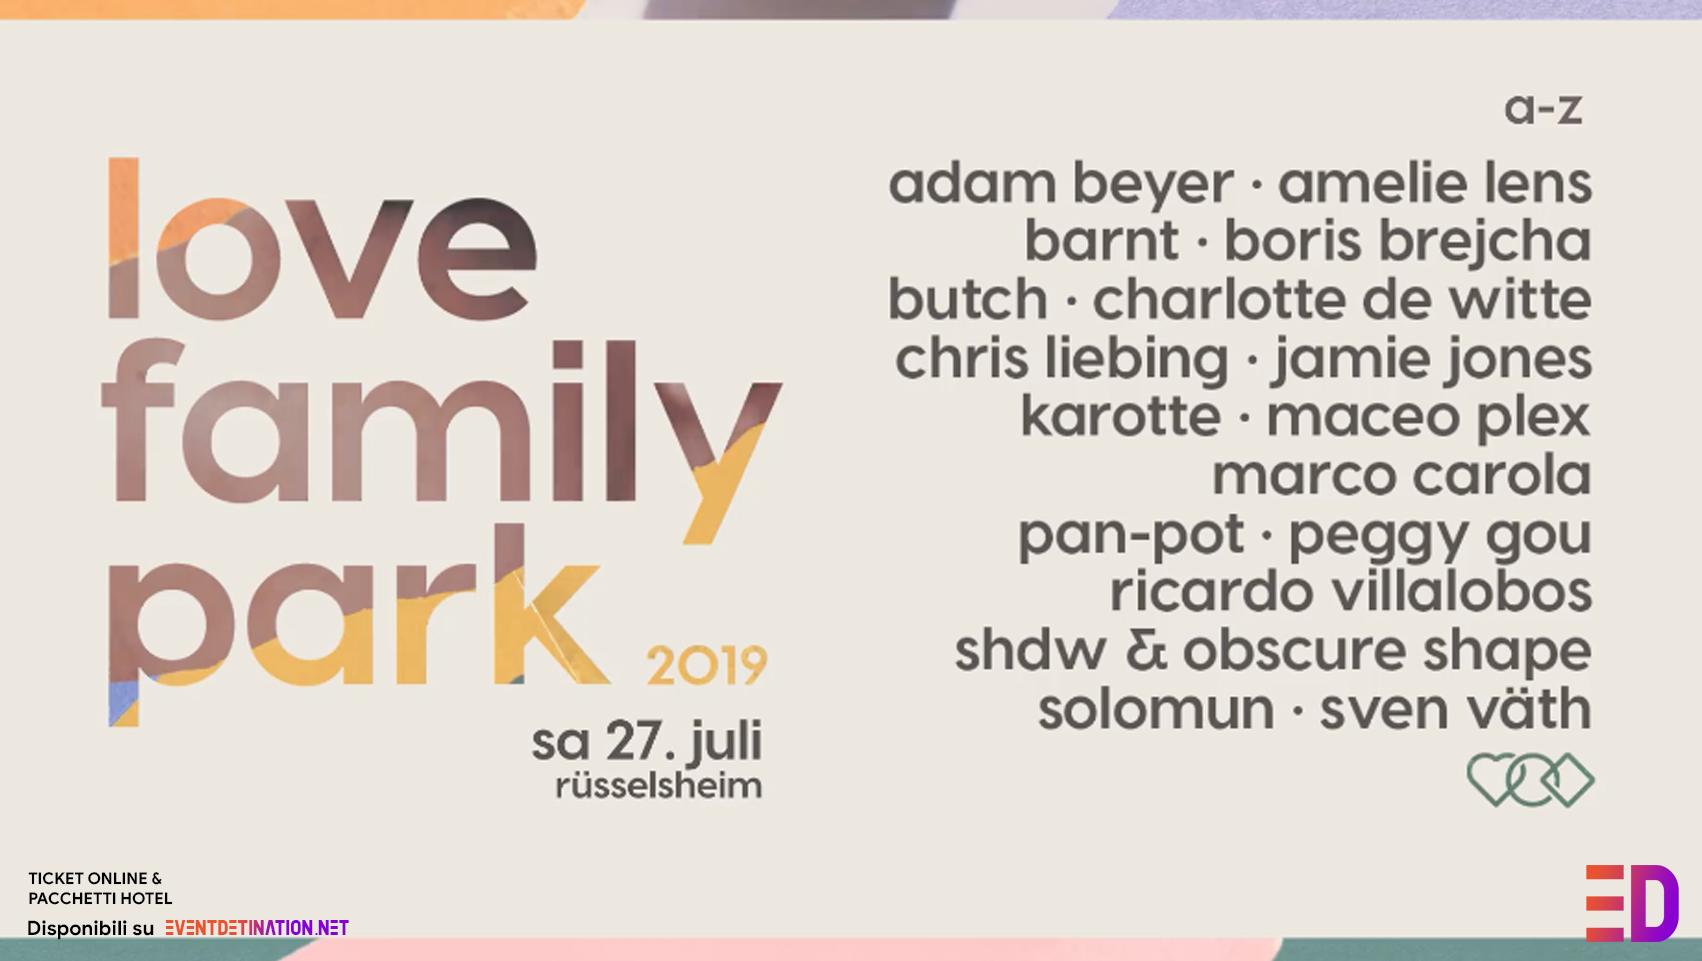 Love Family Park 2019, 27 Luglio Rüsselsheim Mainvorland ( Germania ) | Ticket – Pacchetti